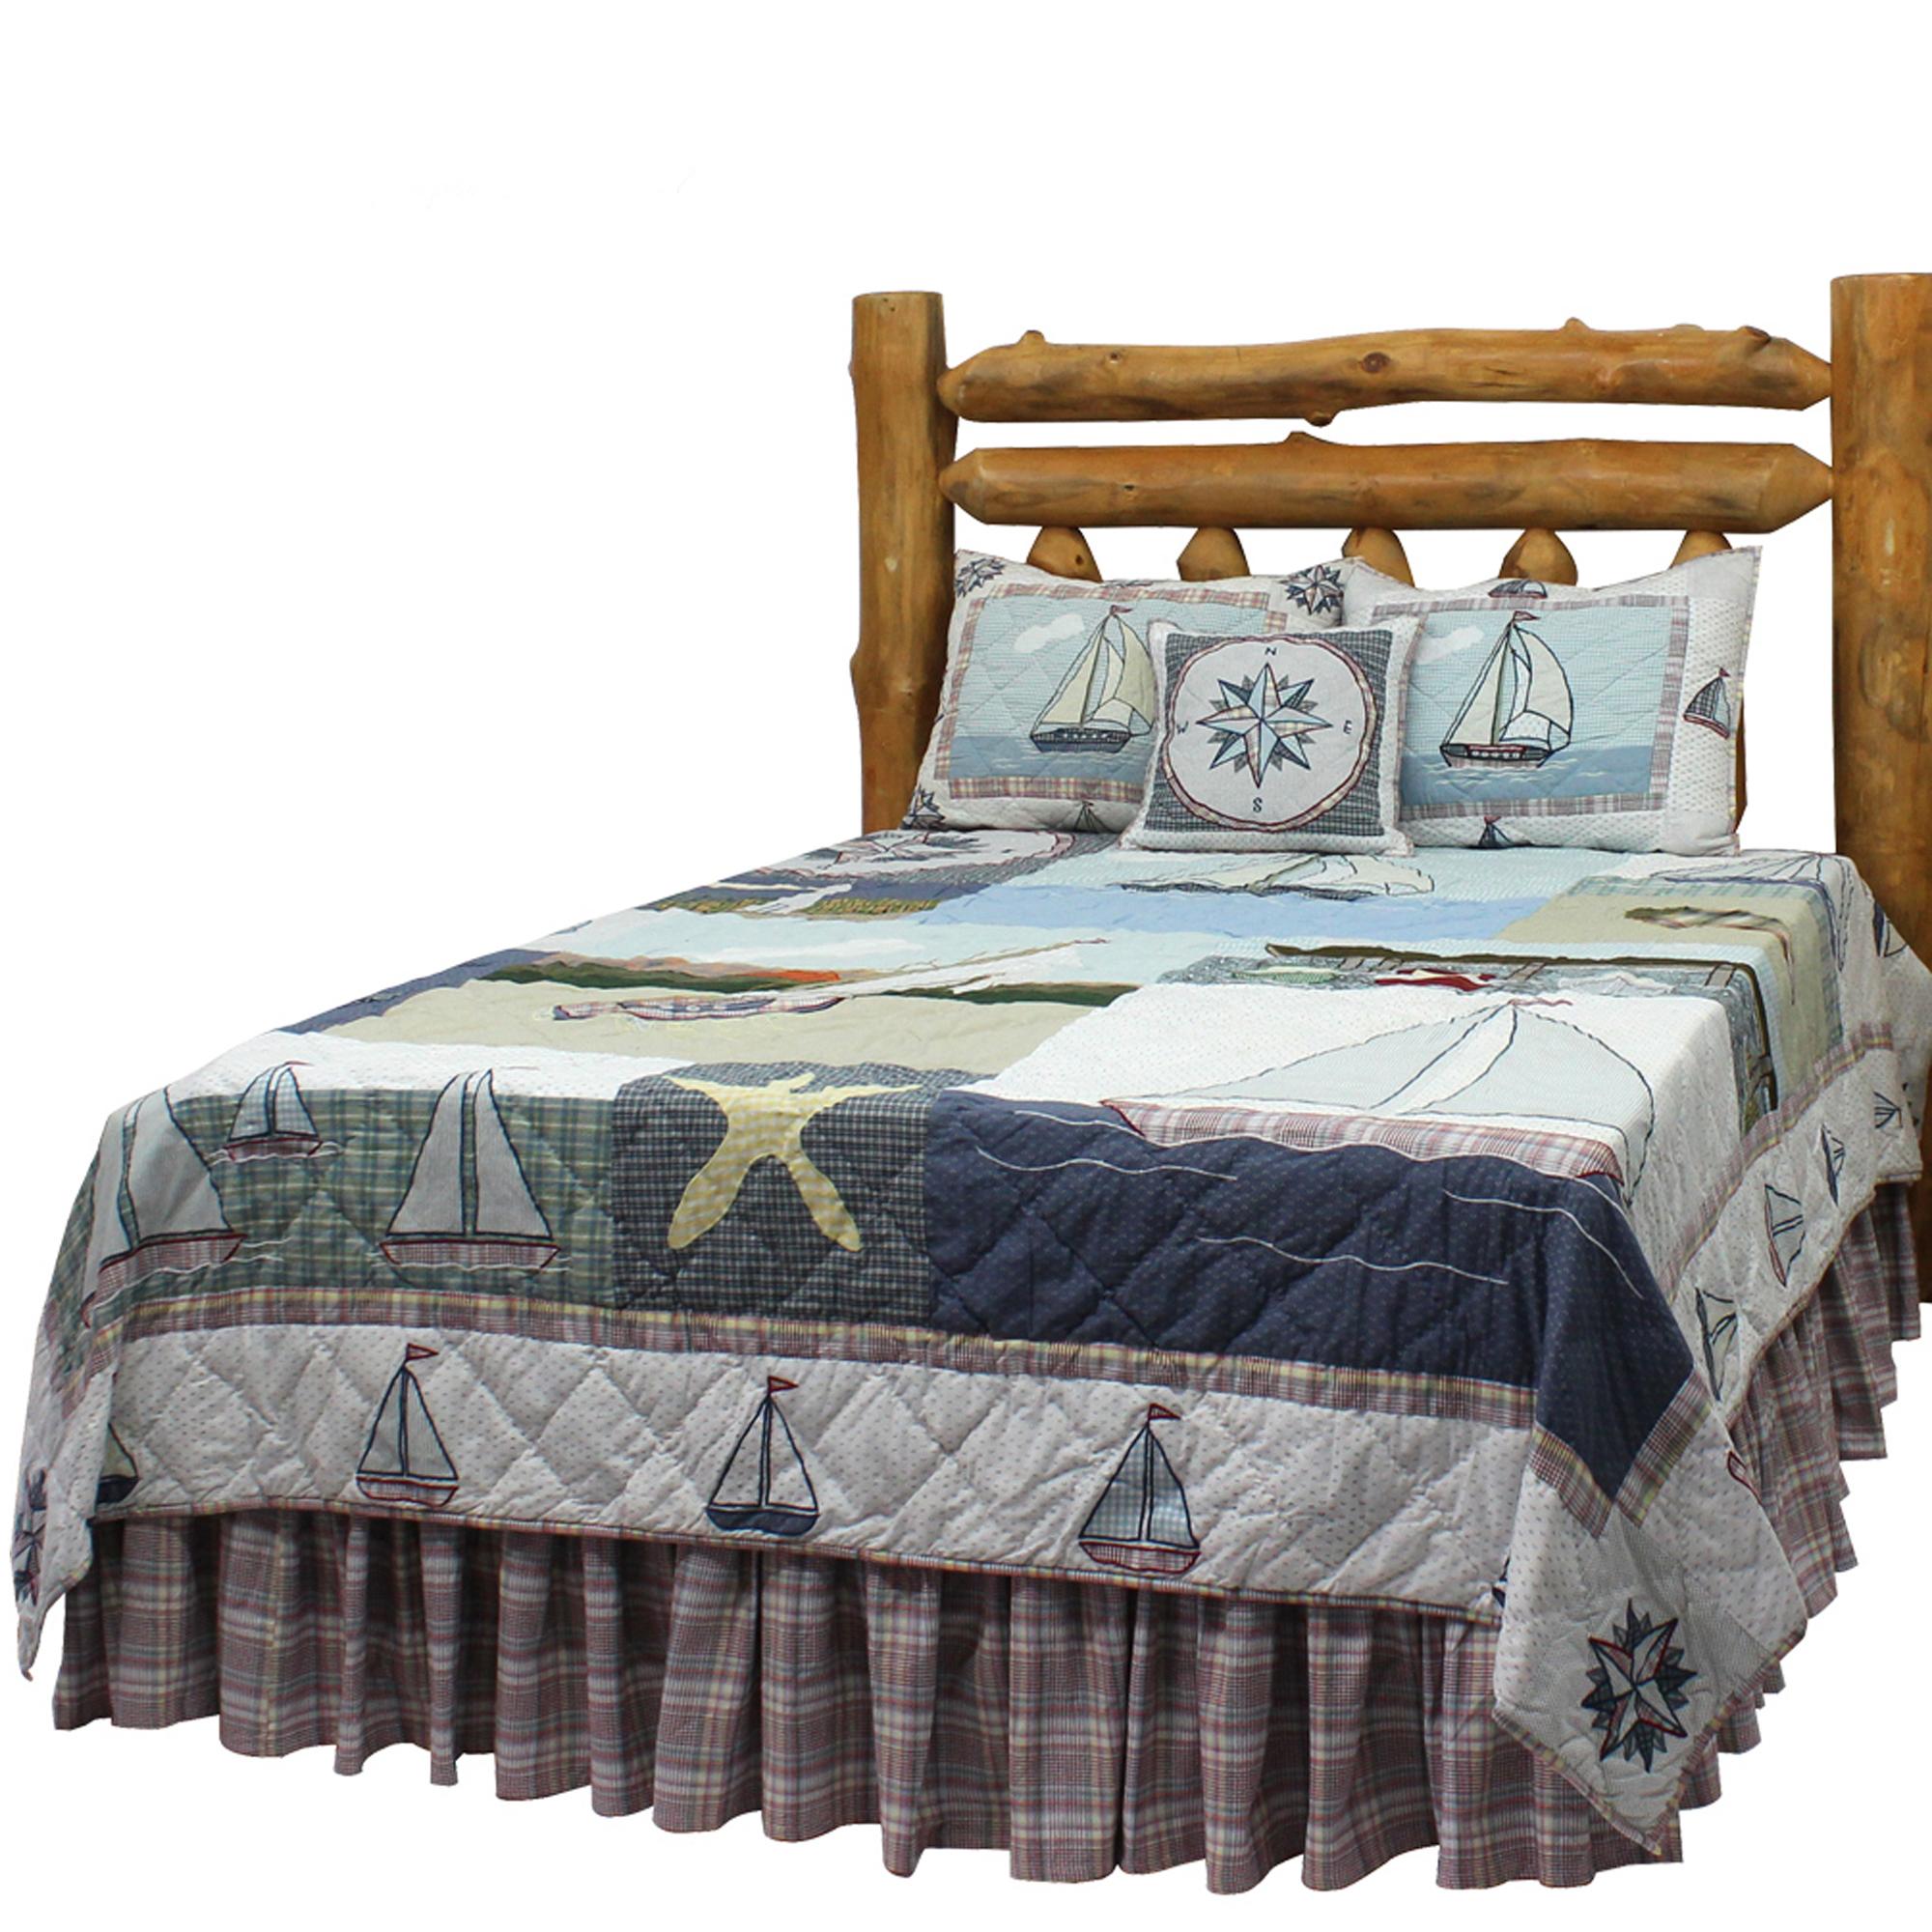 "Nautical Drift King Quilt 105""W x 95""L"